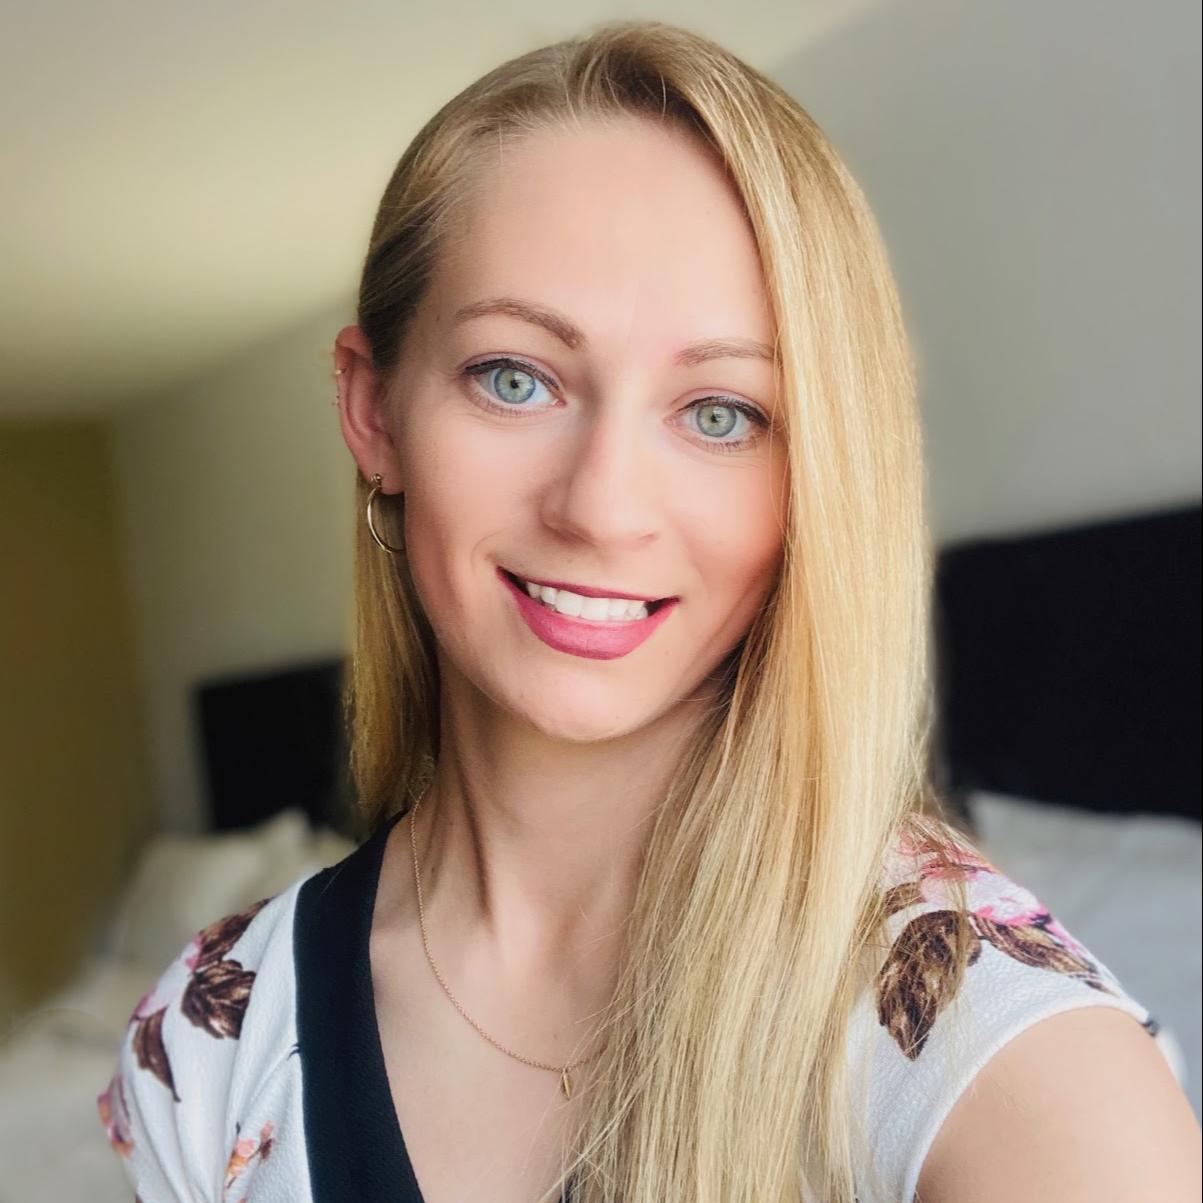 Nicole Cepel